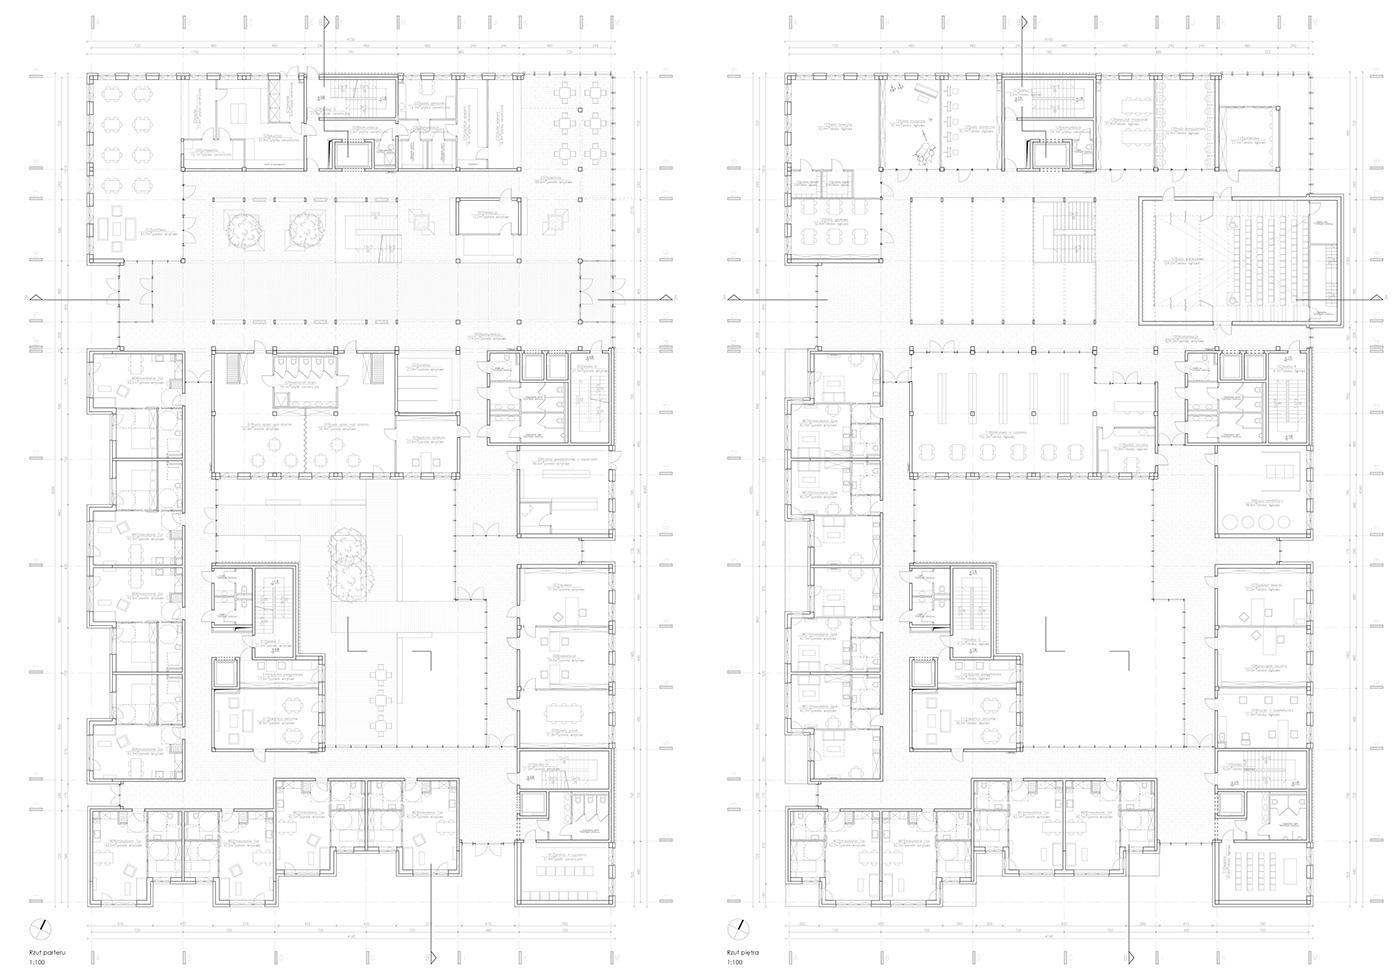 architecture diploma Education education center Elderly Design Elderly housing intergenerational senior home